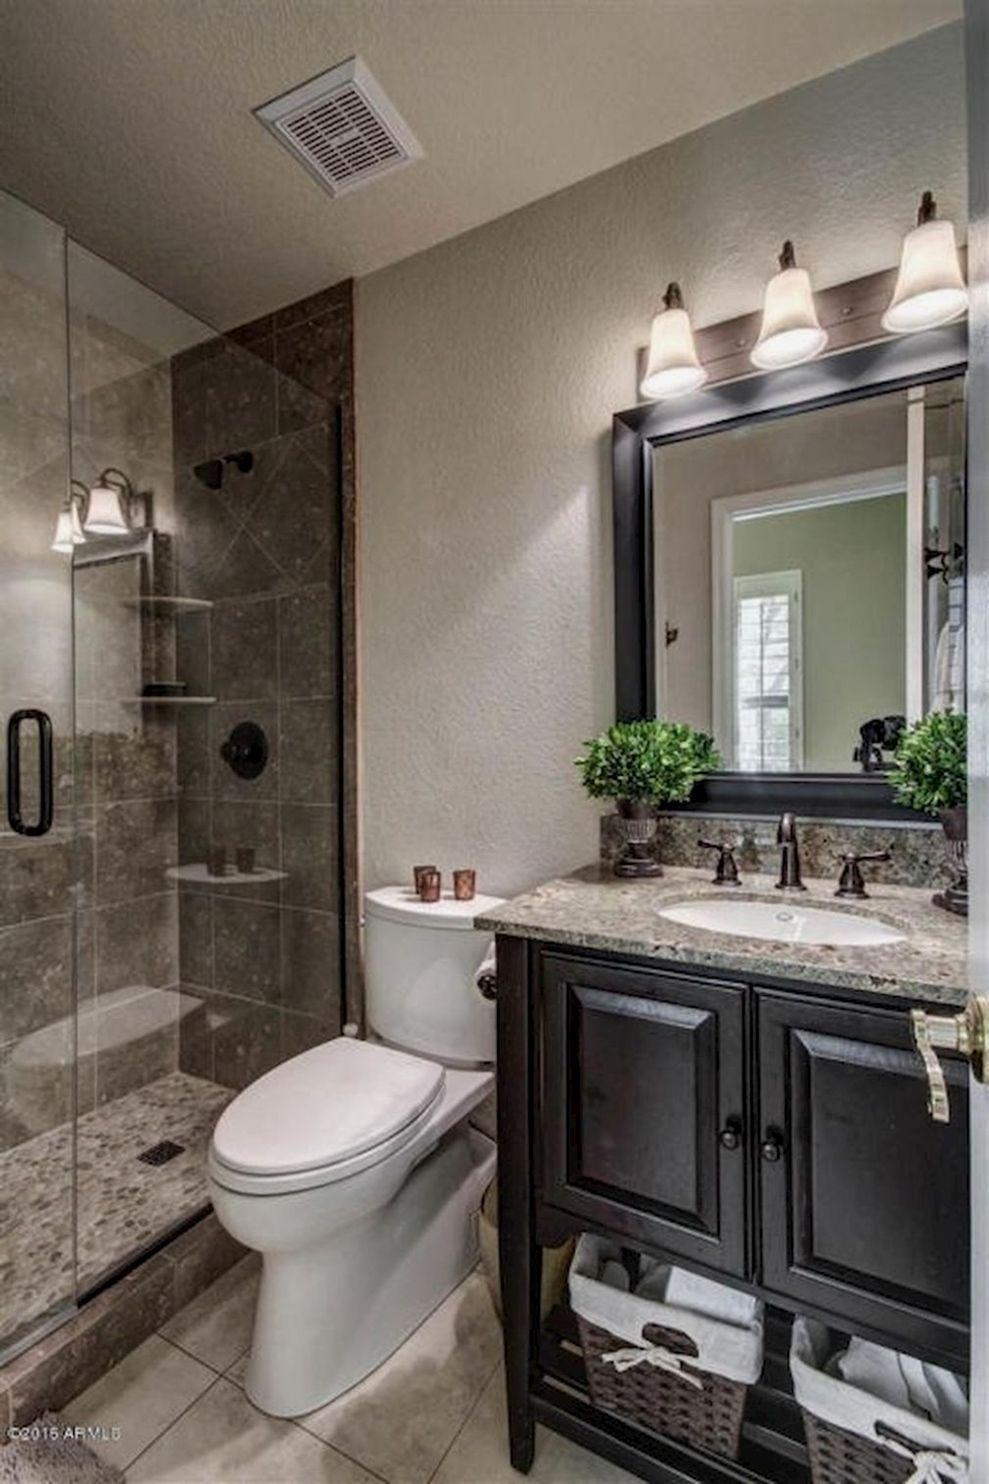 Half Bathroom Ideas Capitalize On A Powder Room S Little Size To Make A Bold Style Dec Bathroom Remodel Shower Bathroom Design Small Master Bathroom Makeover